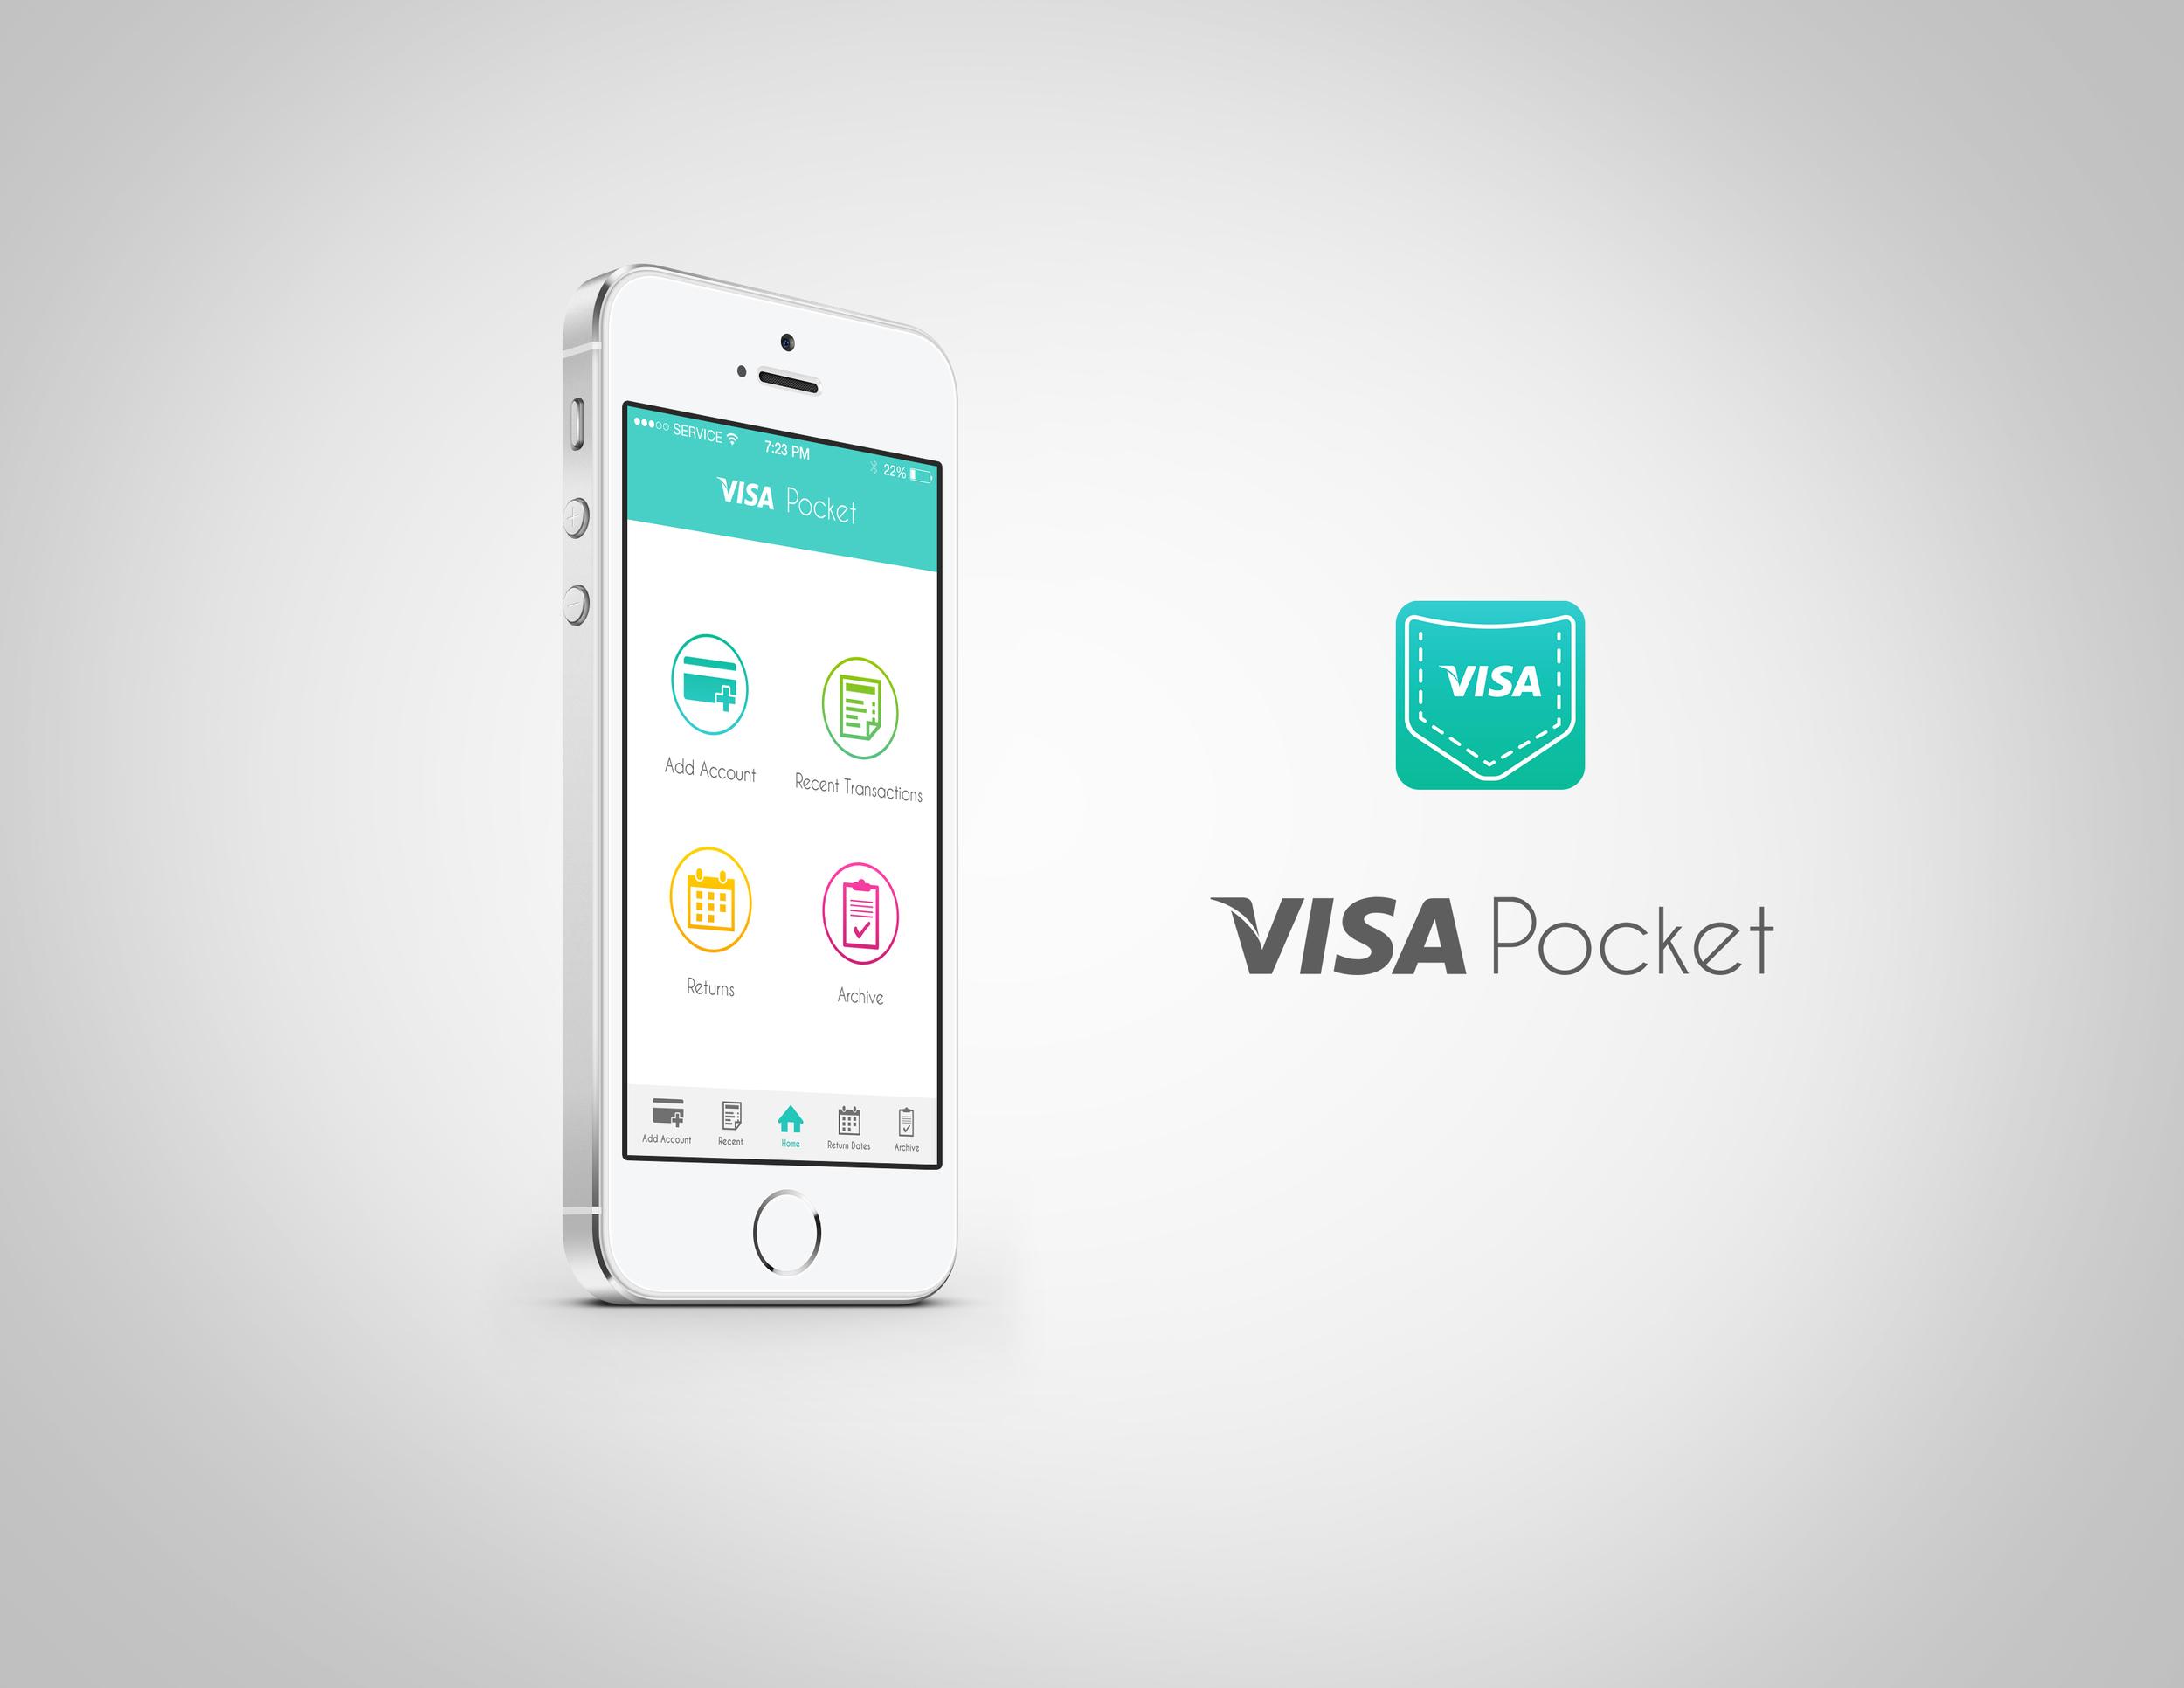 Visa Pocket_PDFfiles_2.jpg